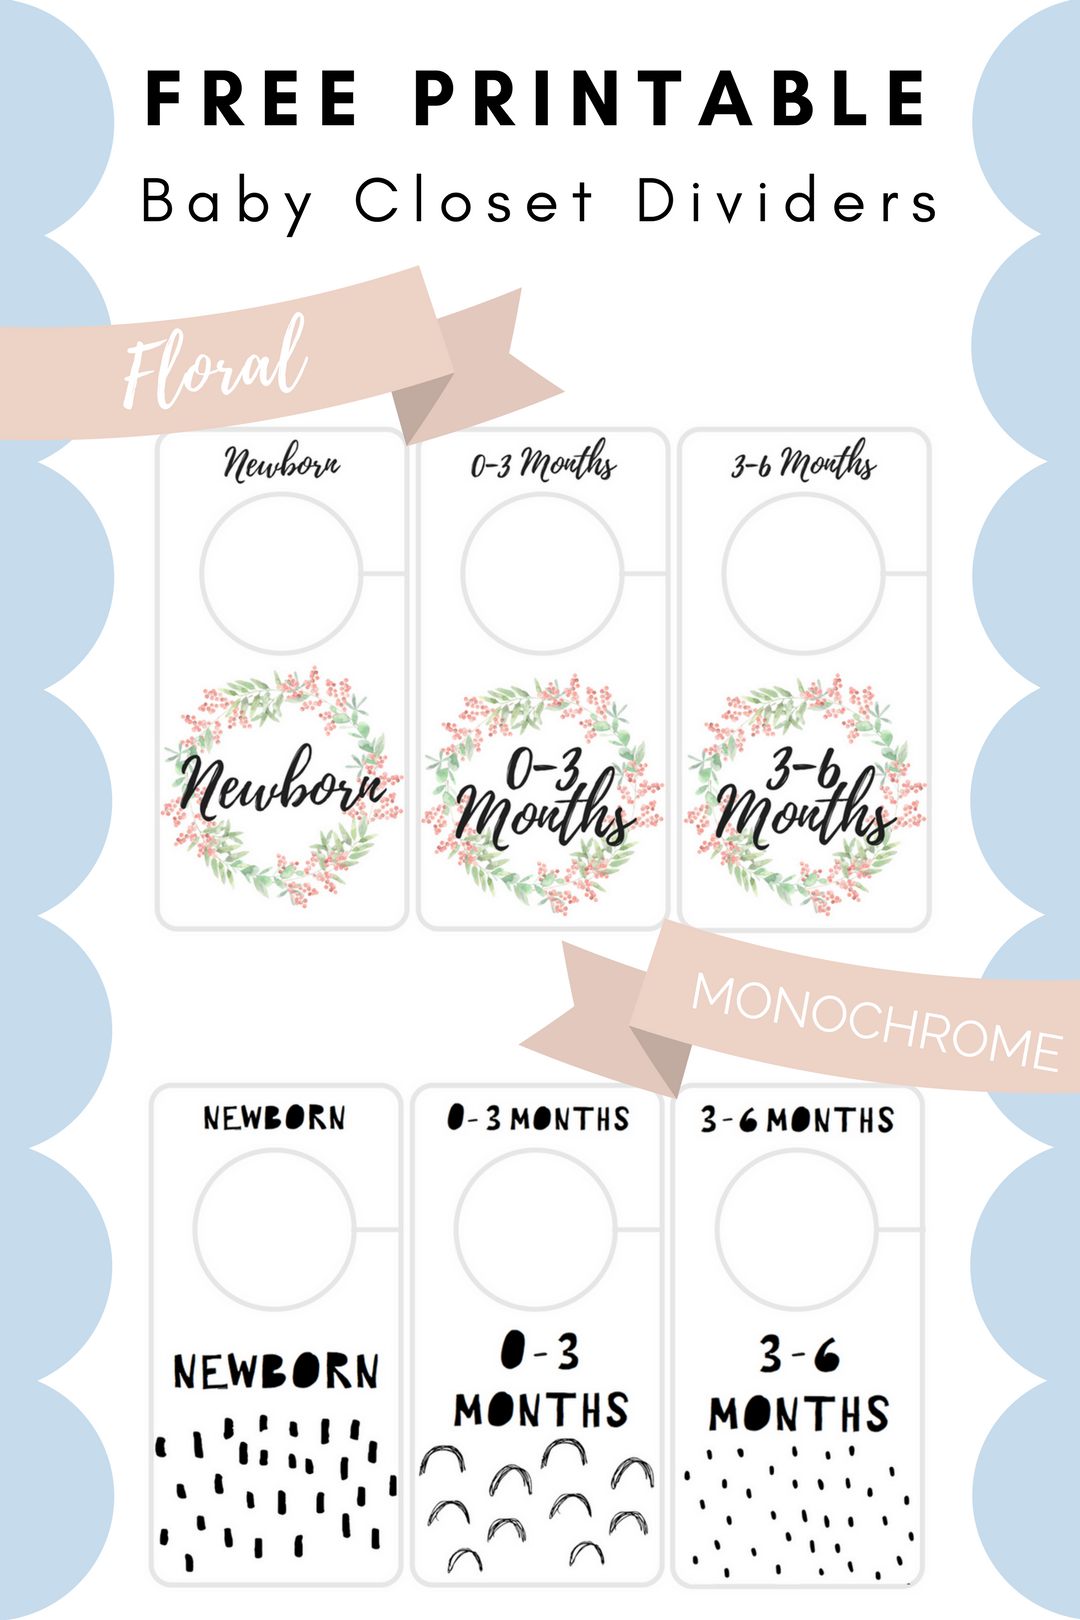 graphic regarding Printable Yardstick identify Totally free Printable Youngster Closet Dividers Preemie toward 24 Weeks - 2